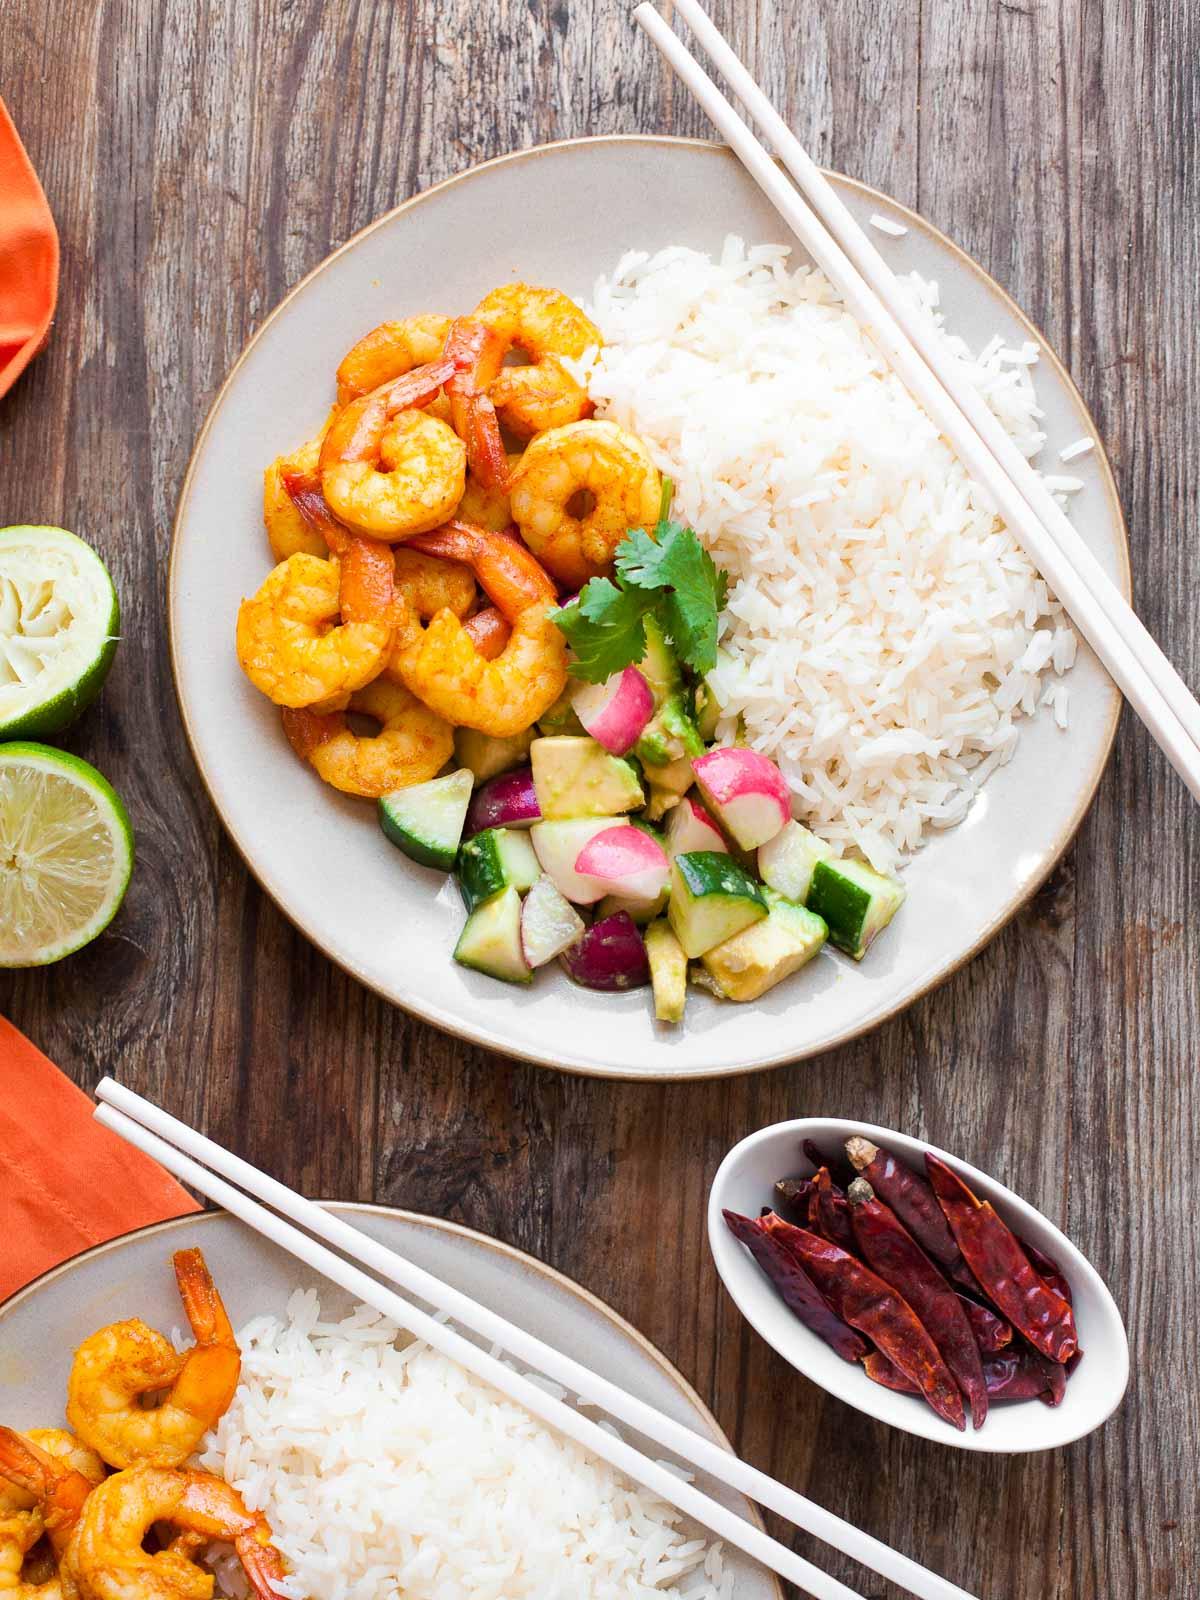 http://www.acalculatedwhisk.com/2015/03/burmese-chile-prawns-cucumber-avocado-salad.html